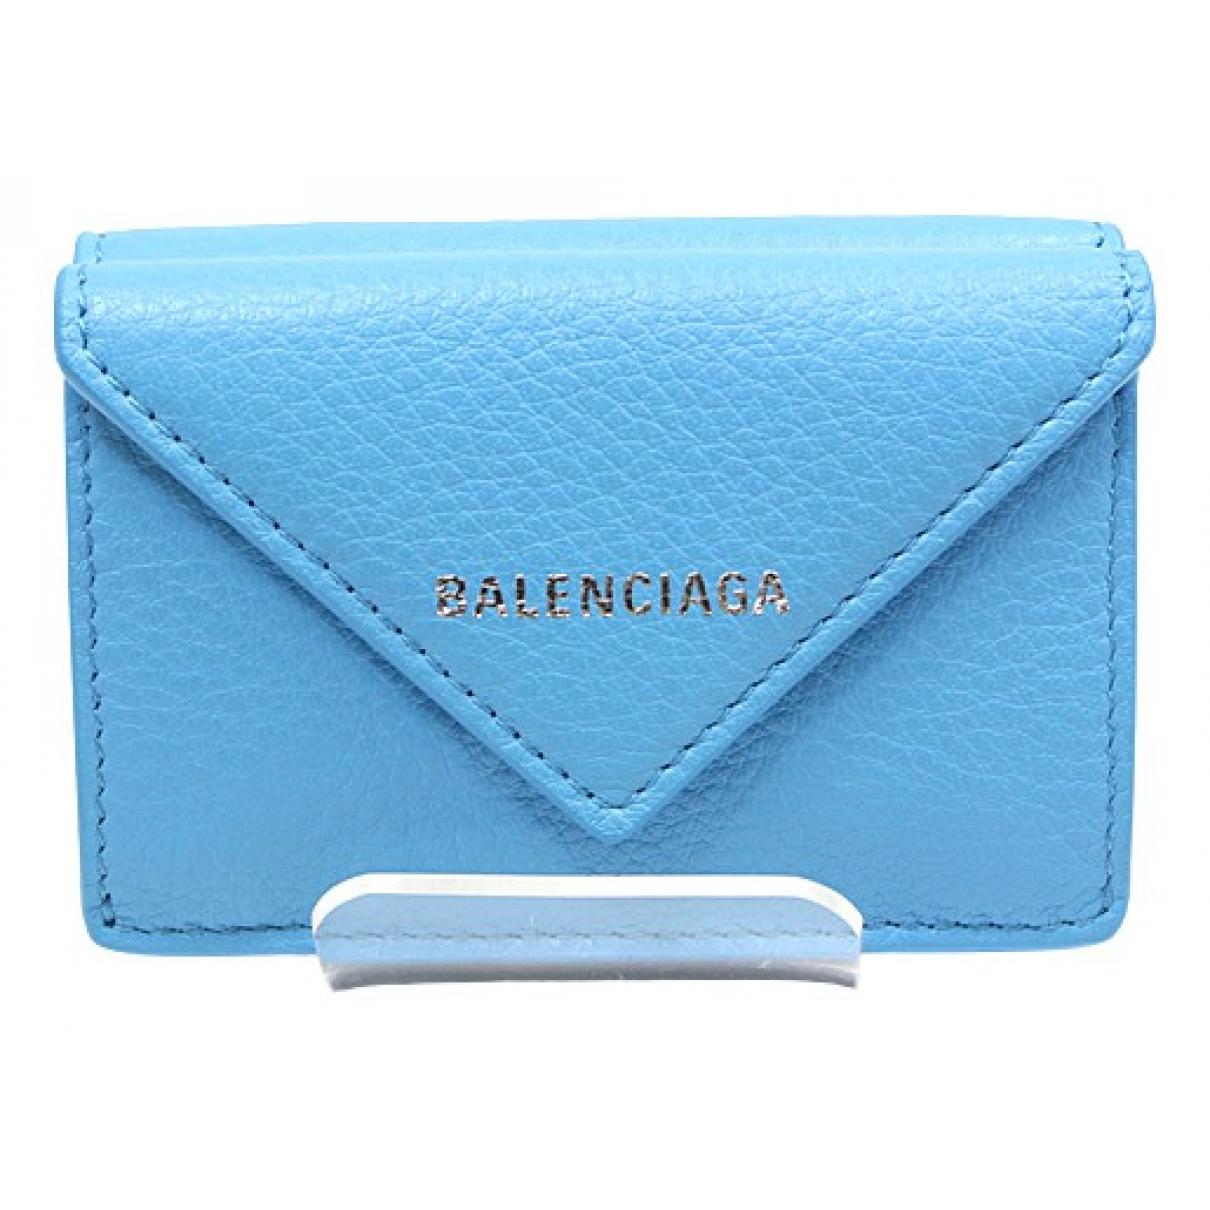 Balenciaga \N Portemonnaie in  Blau Leder